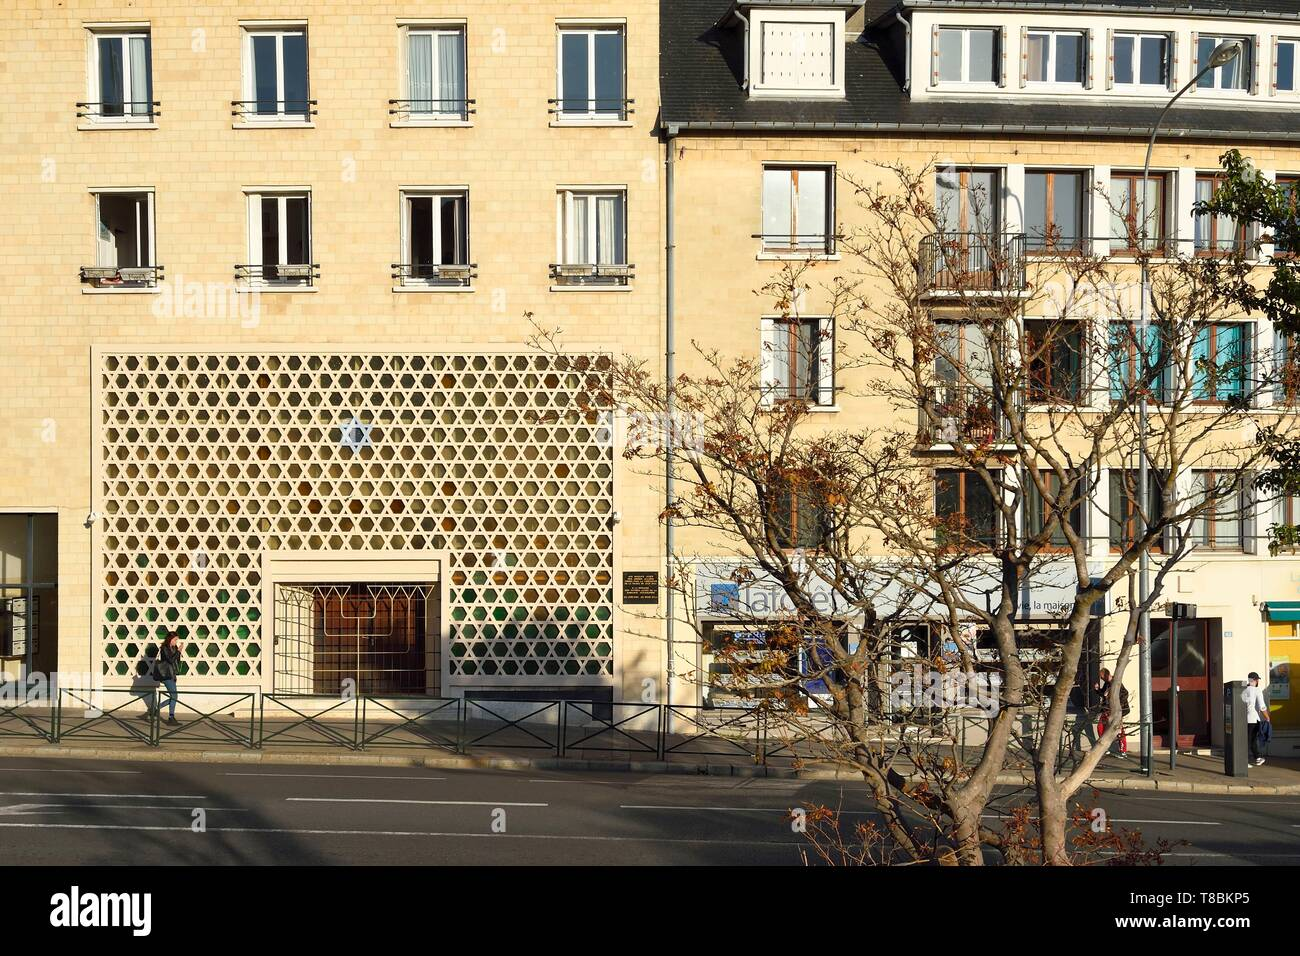 France, Calvados, Caen, the synagogue - Stock Image